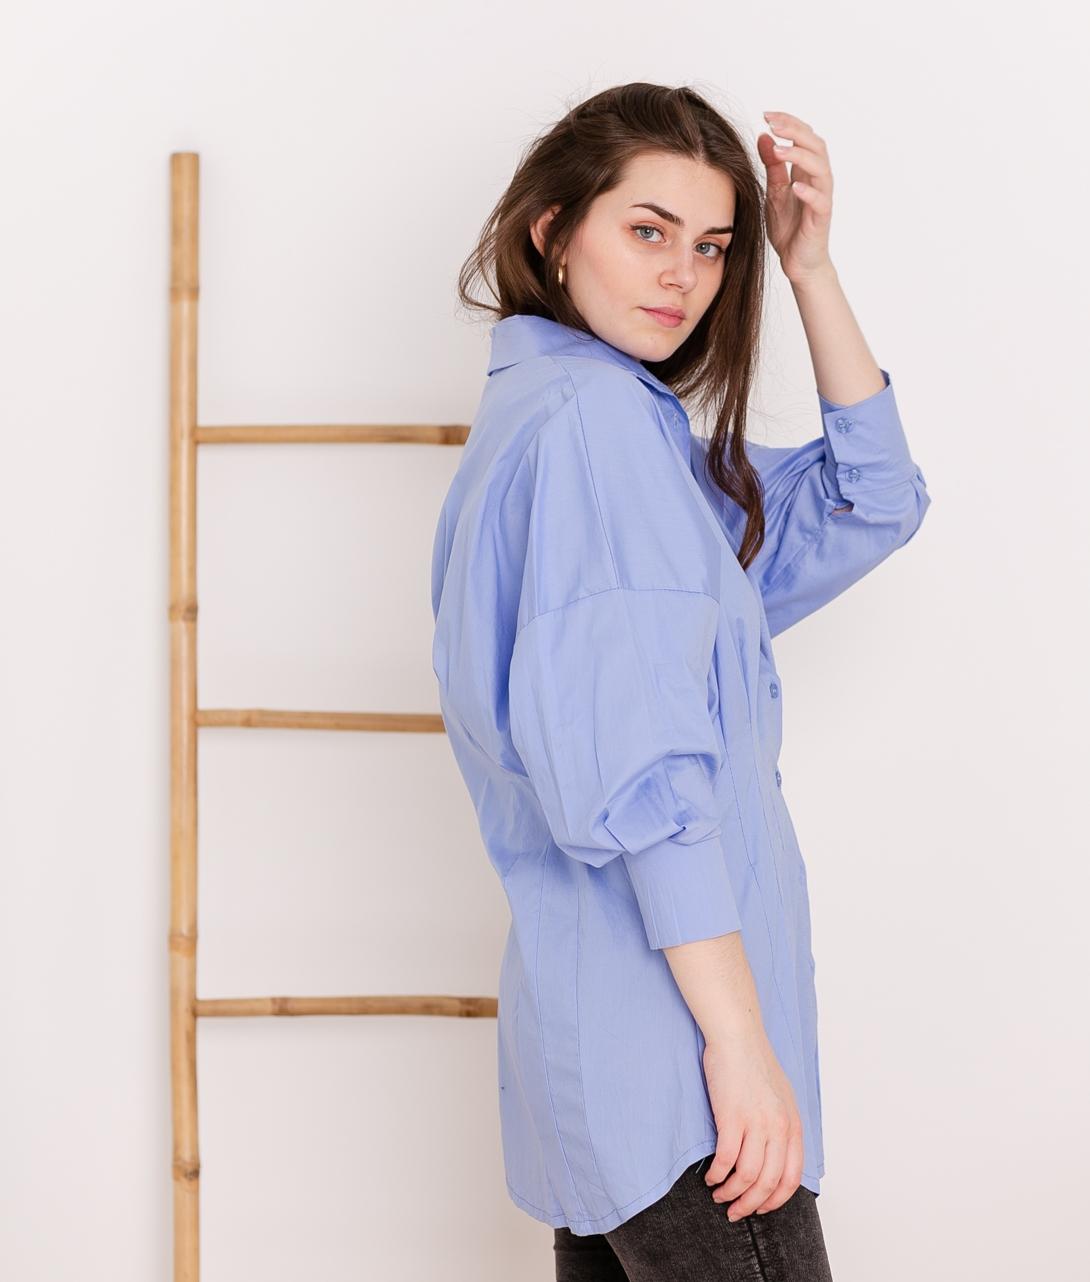 Camisa Onigumo - Azul